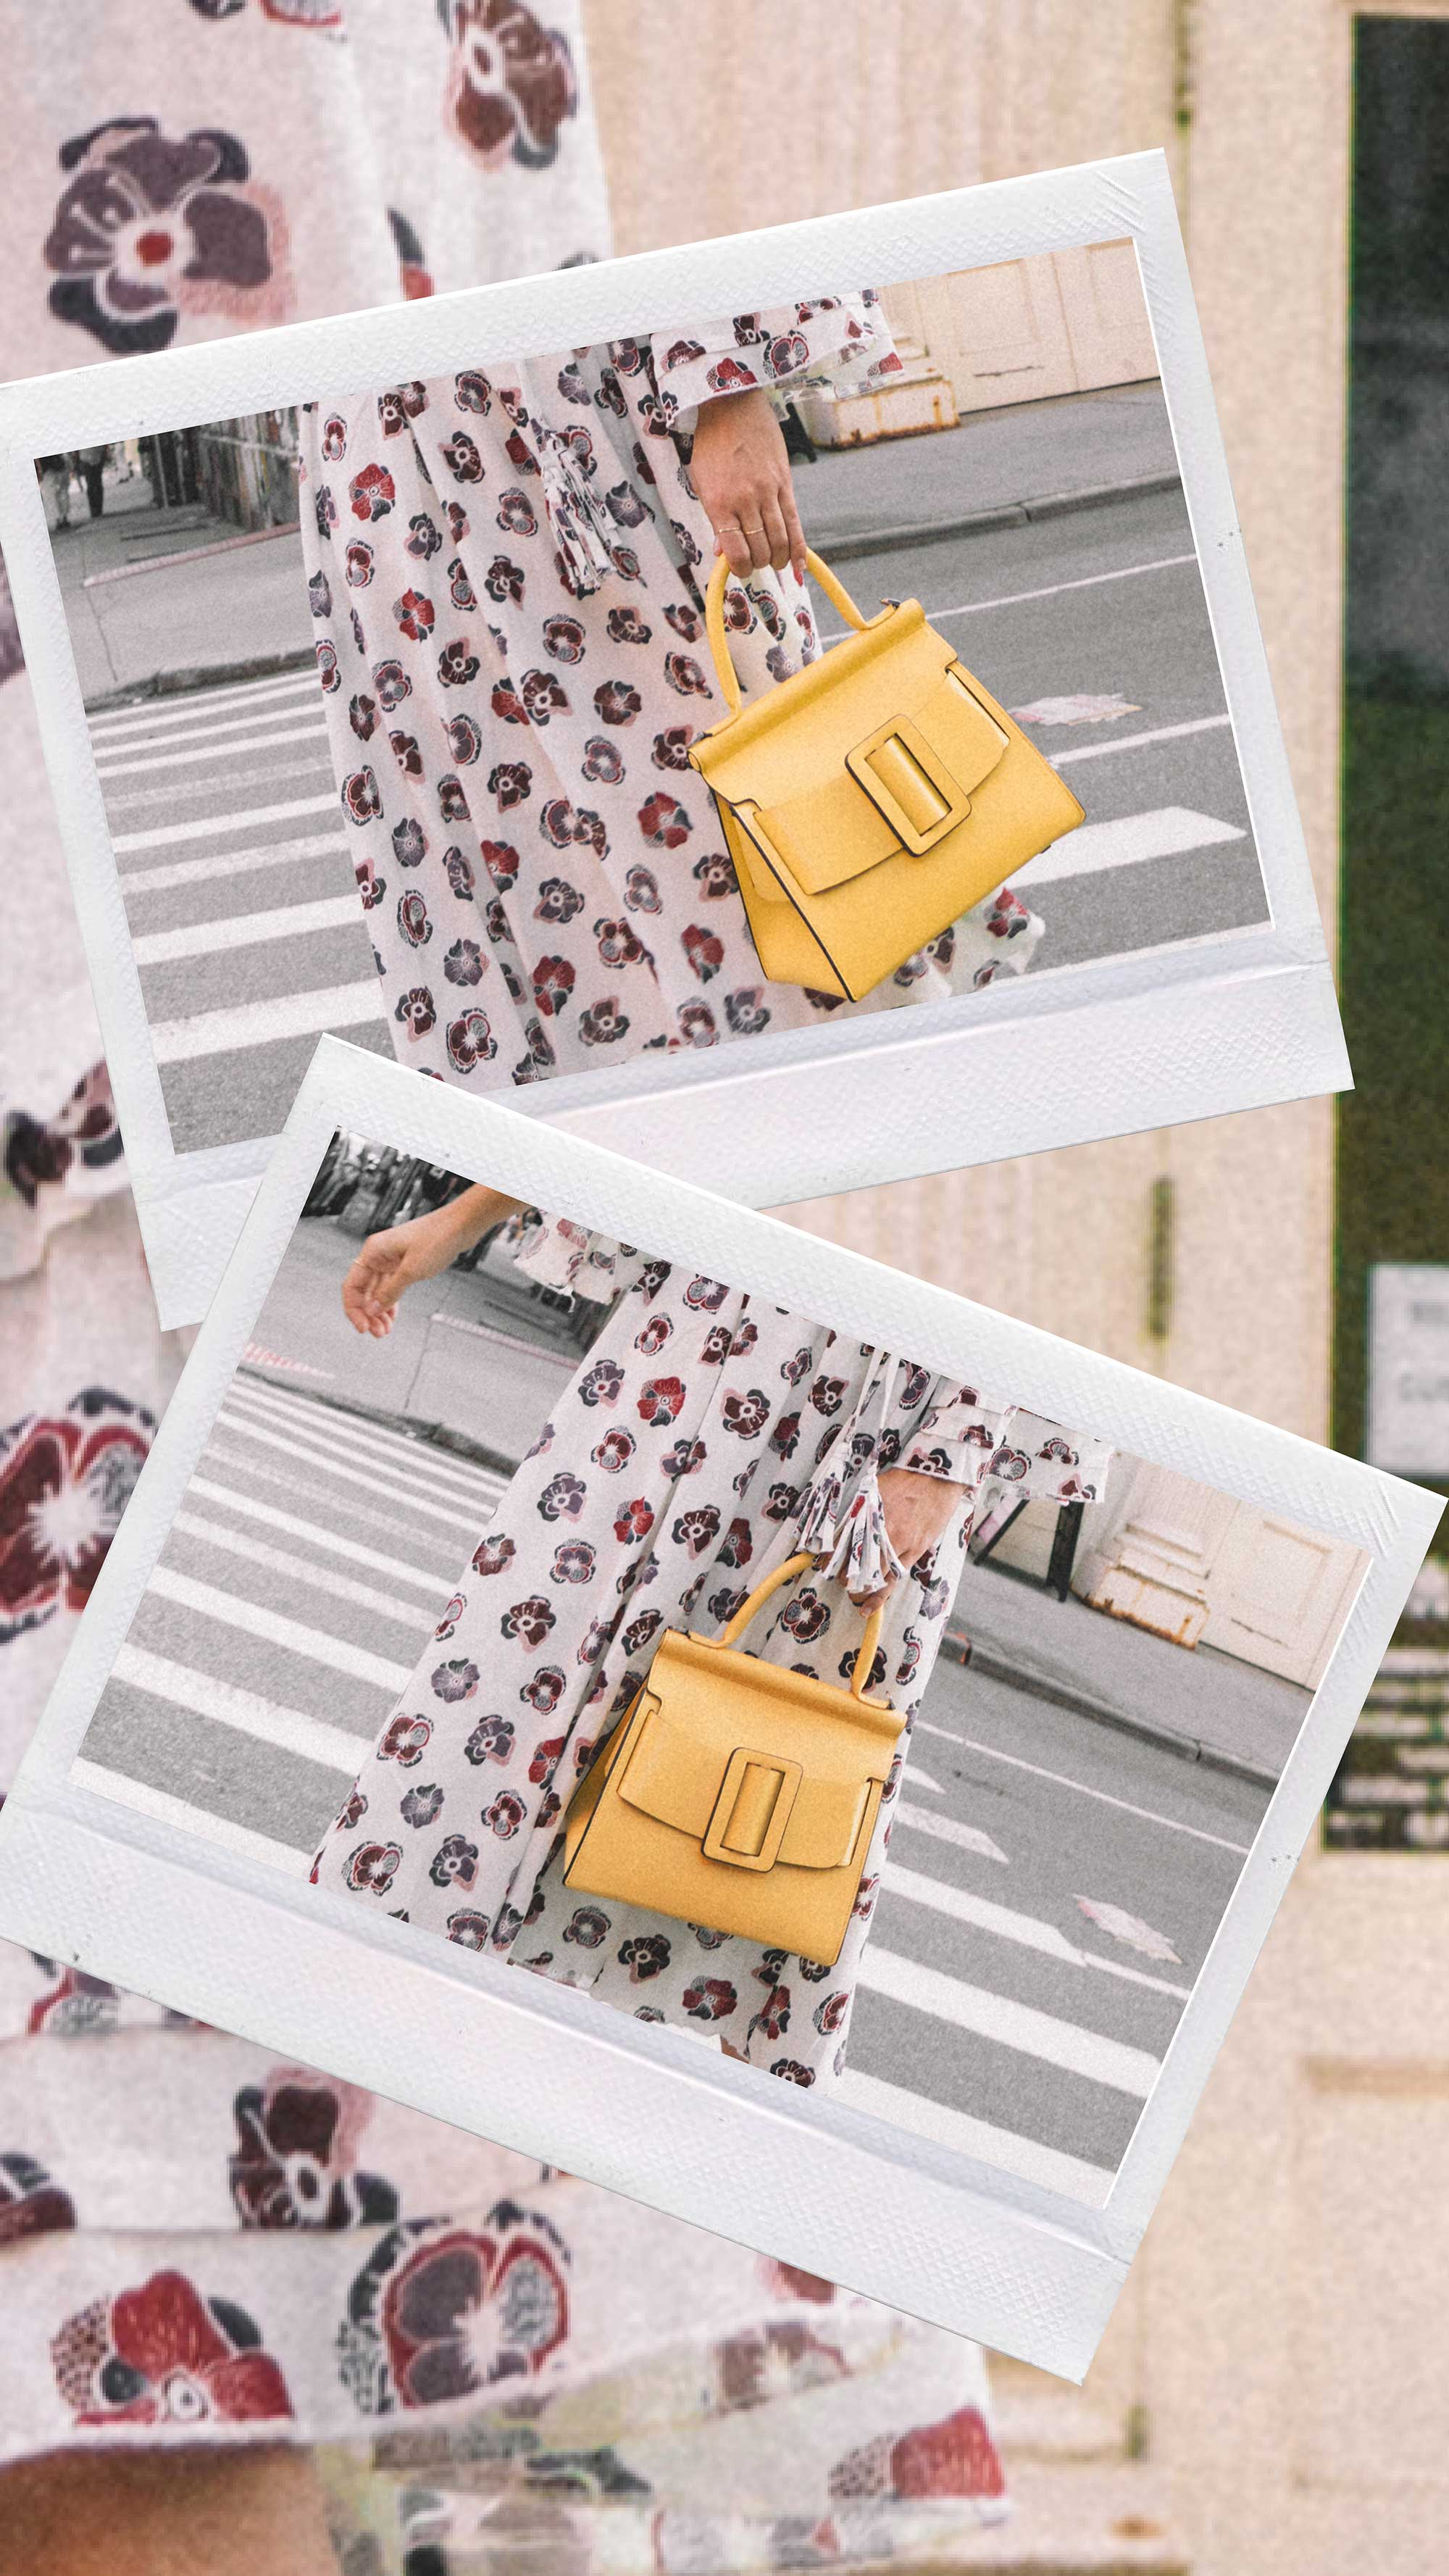 Madewell x Karen Walker Floral Fantasia Ruffled Dress and BOYY Karl 24 Bag soho new york fashion week outfit13.jpg